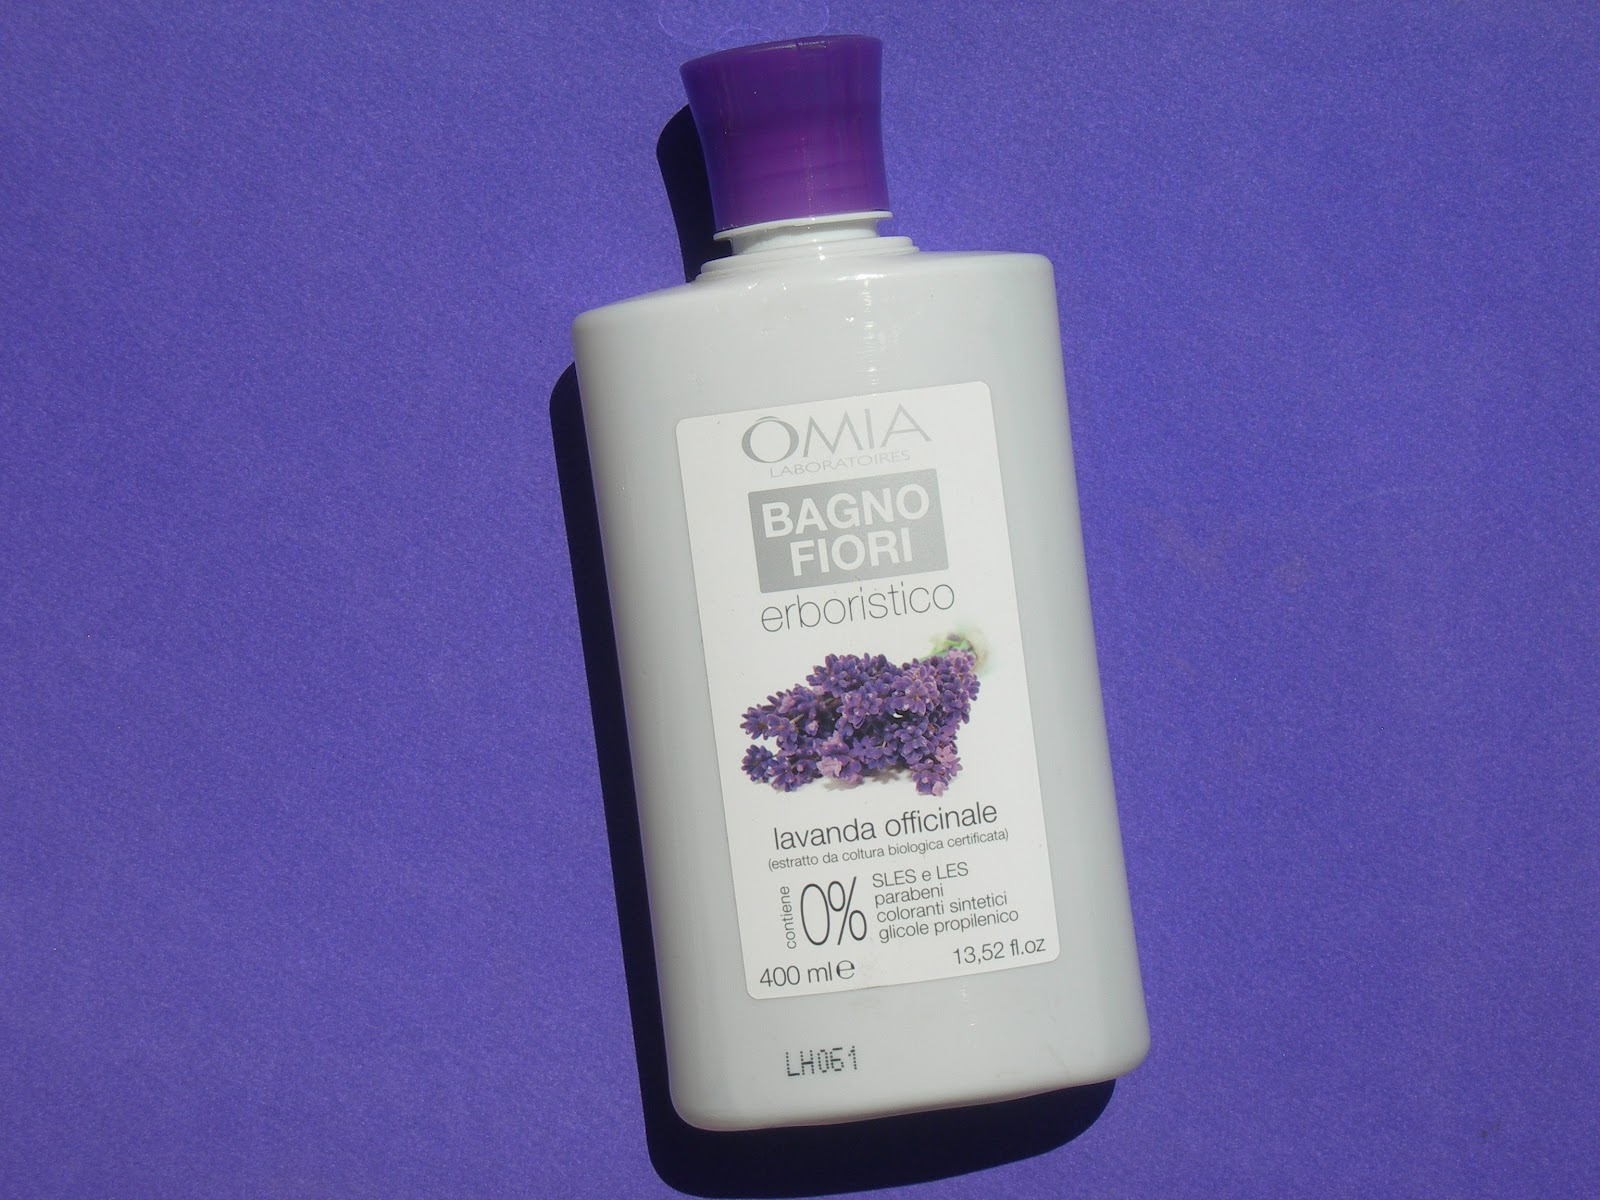 Bagno Doccia Avena Yves Rocher : Review yves rocher shampoo spülung Самые популярные видео